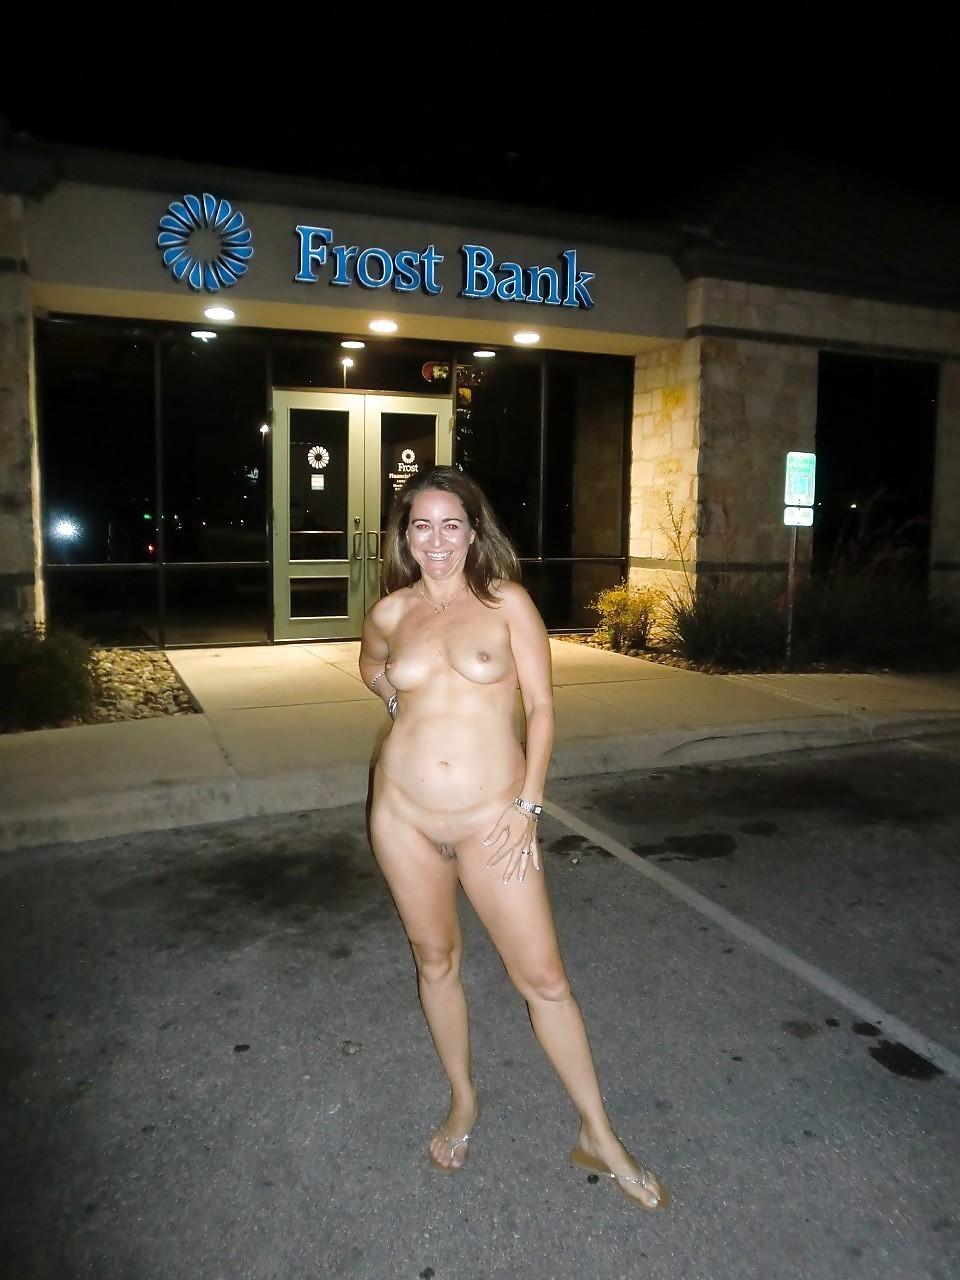 Porn swinging couples naked swinging couples exhibitionist naked public sex wifebucket nude